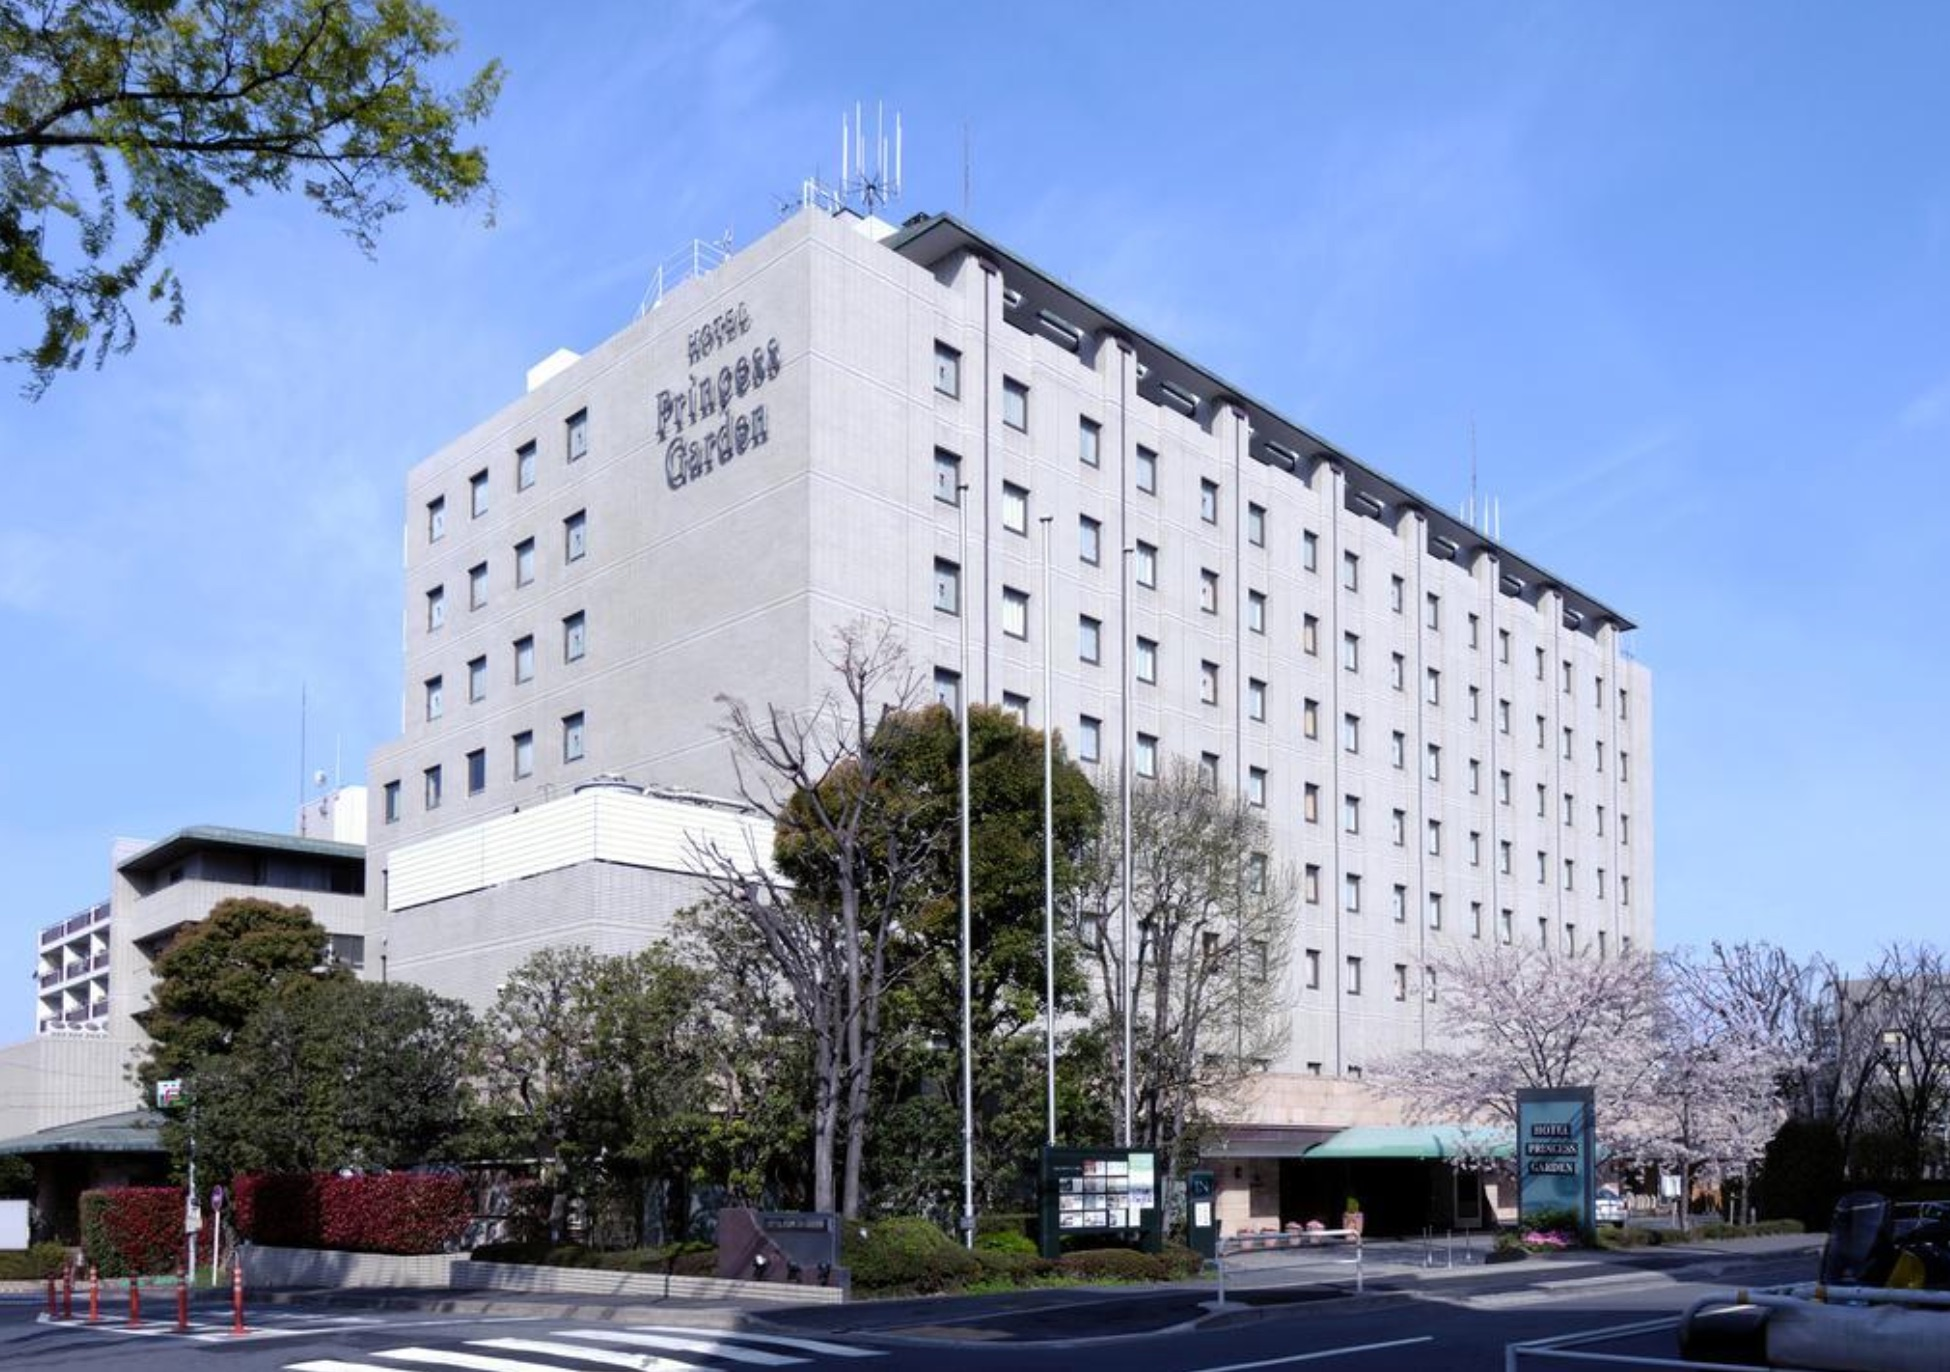 HOTEL_PRINCESS_GARDEN 1.jpg